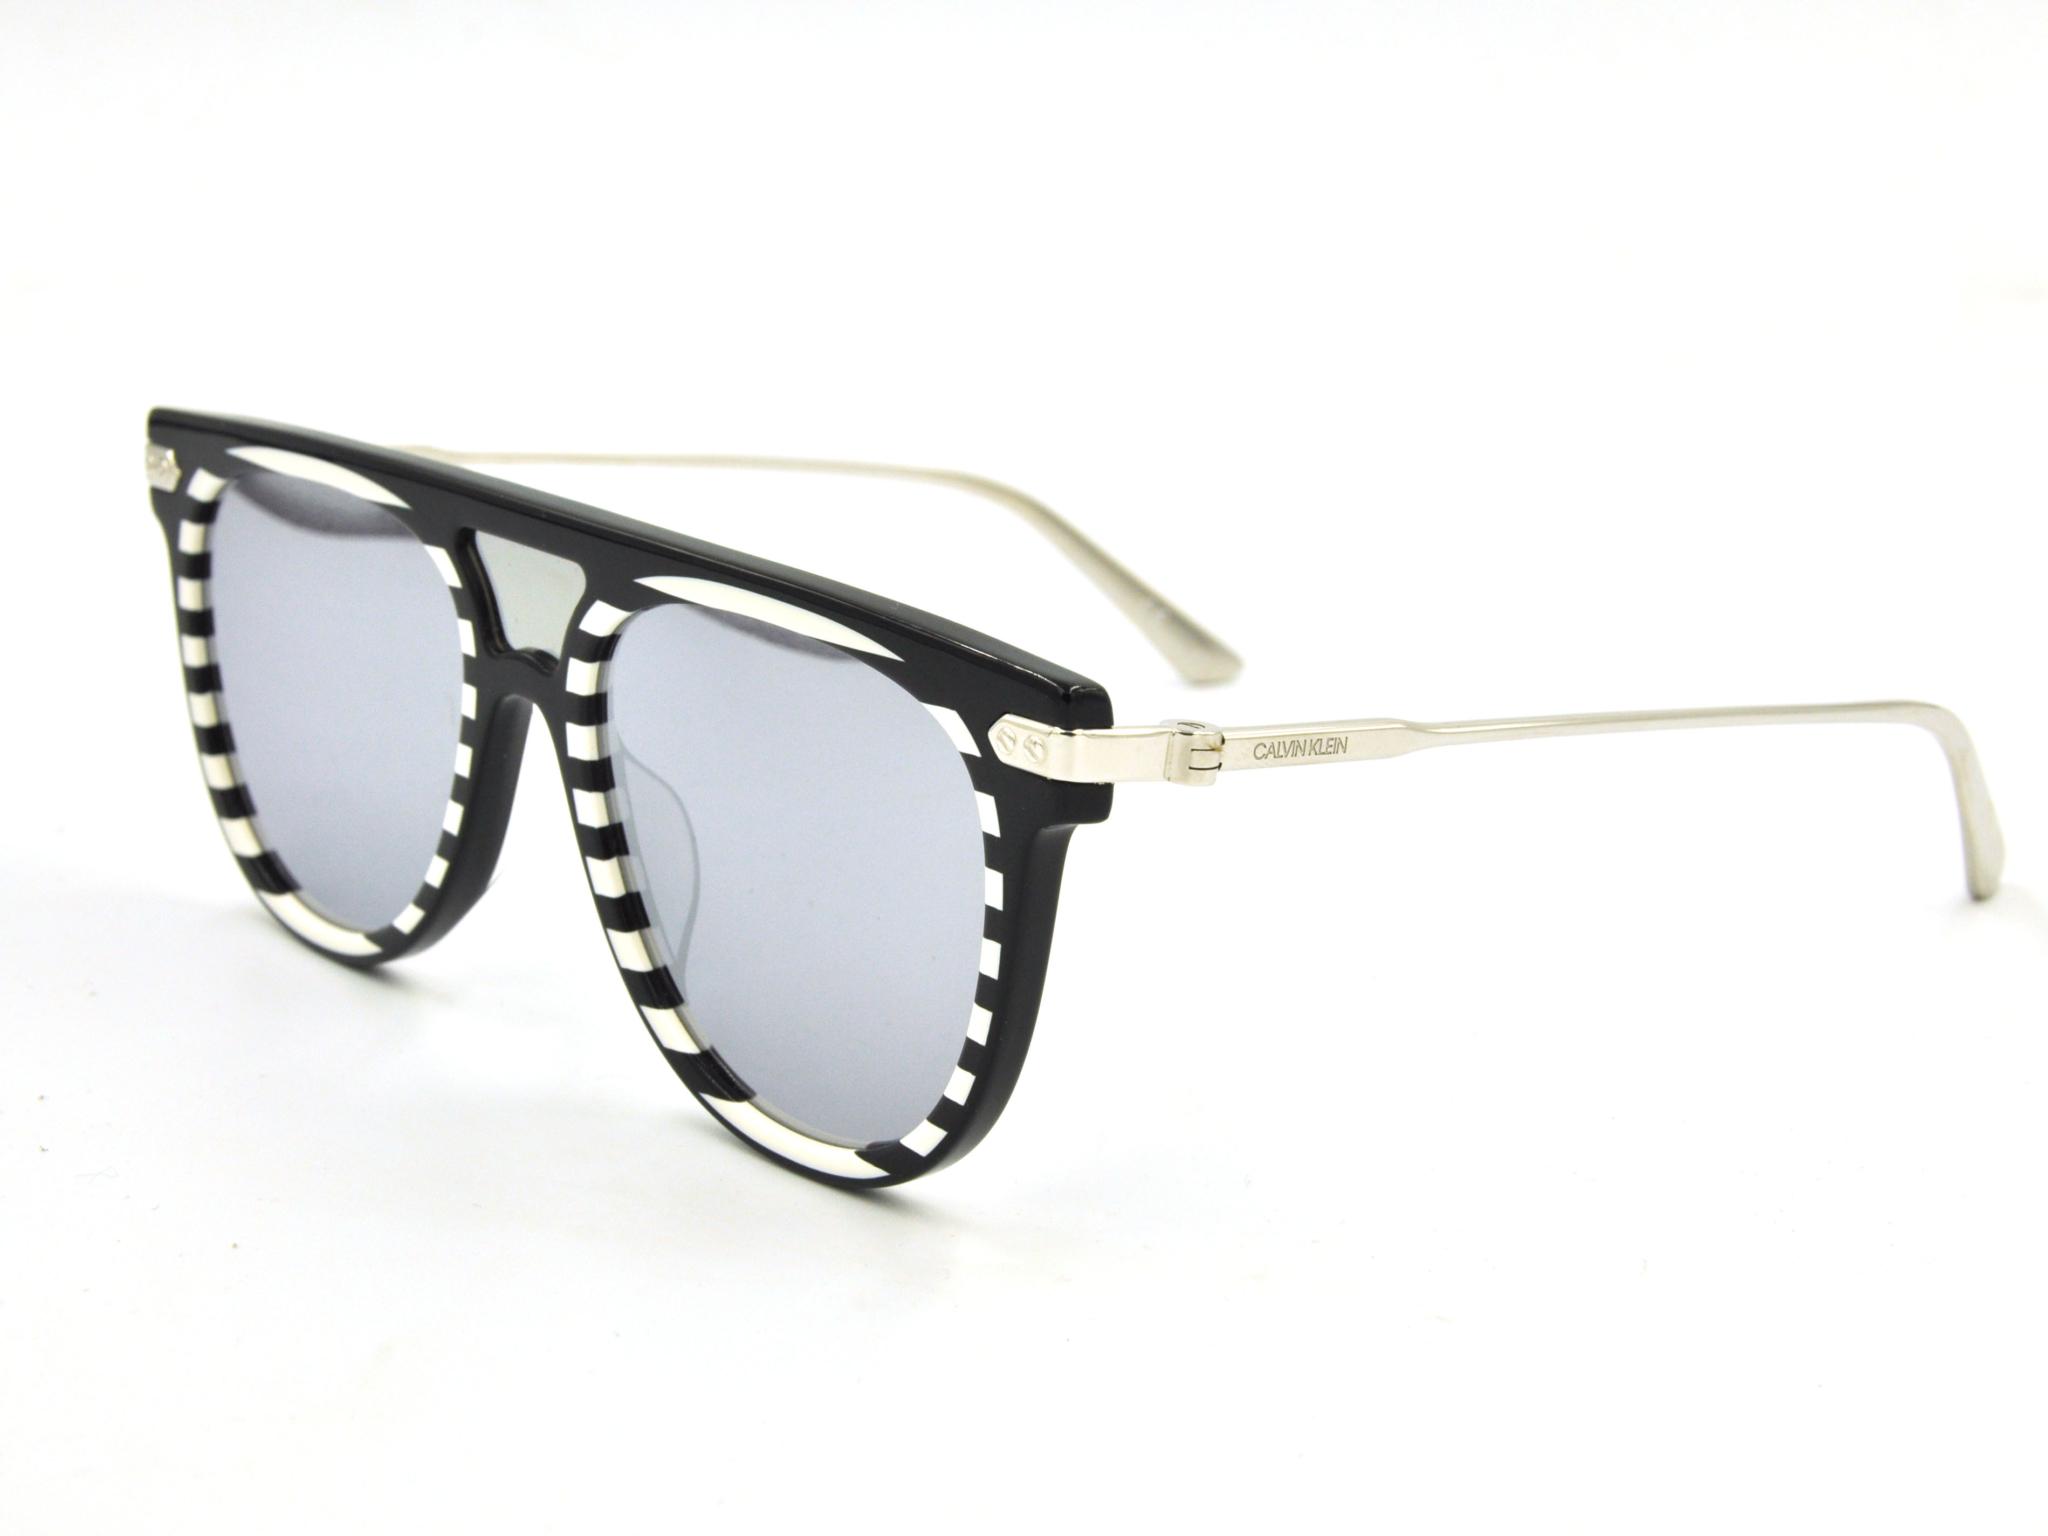 CALVIN KLEIN CK18703S 005 Sunglasses 2020